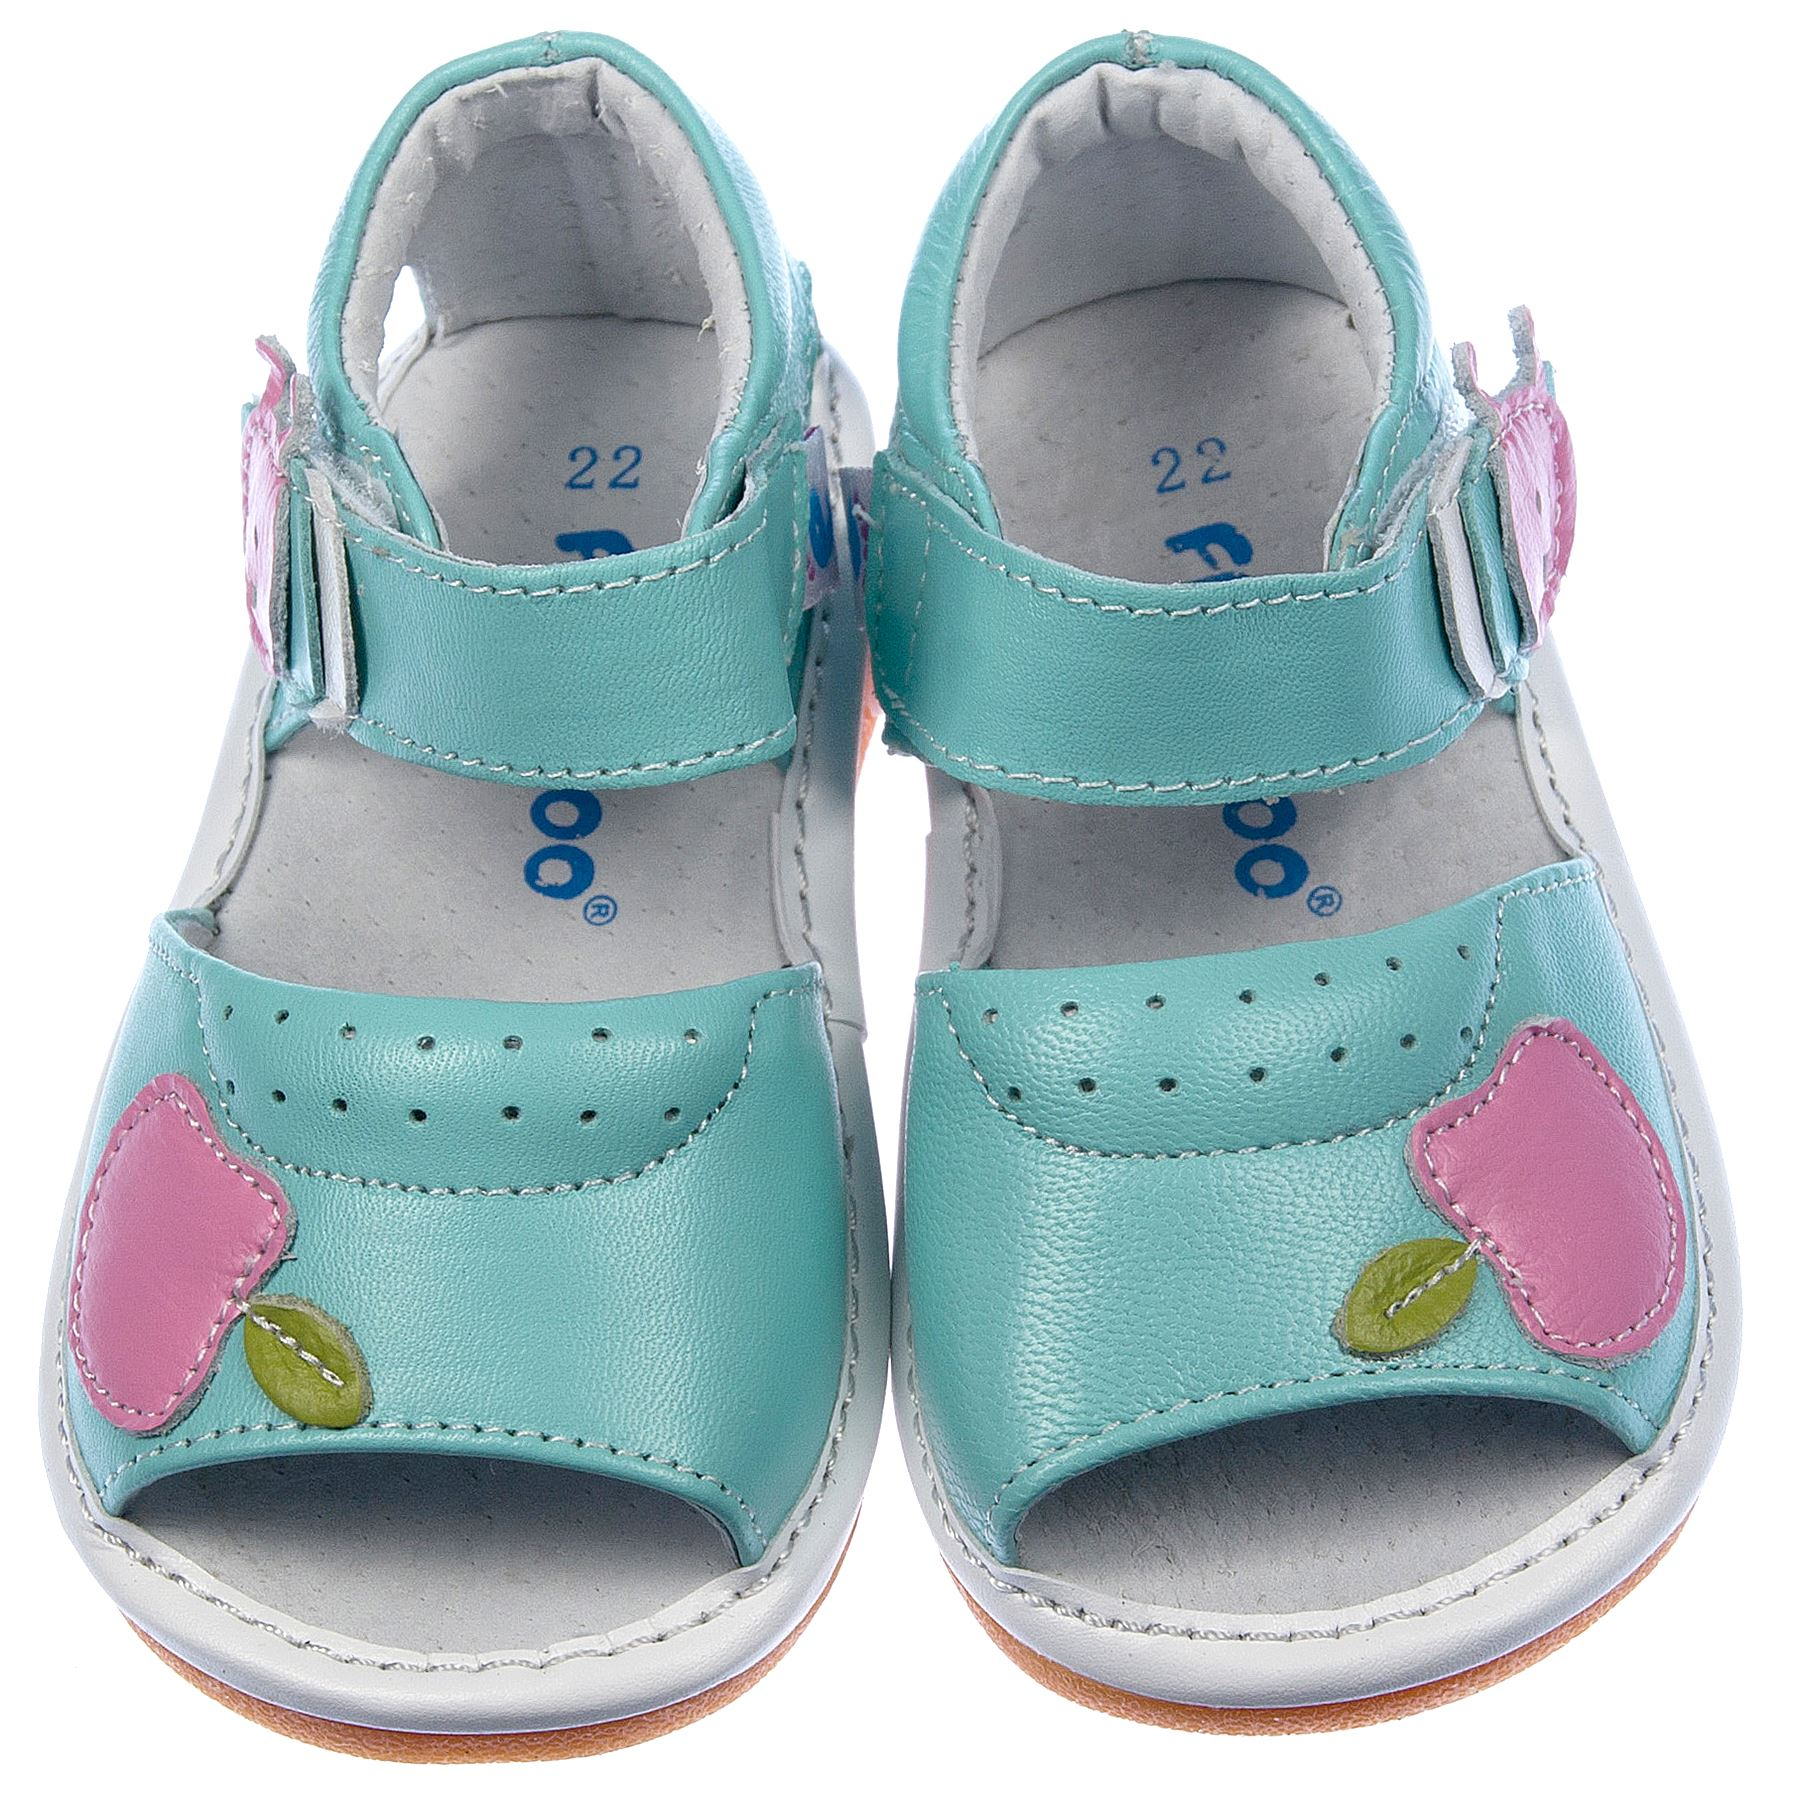 38e4d3613 Sandalias chirriantes para Niña Bebé Infantiles Piel Auténtica